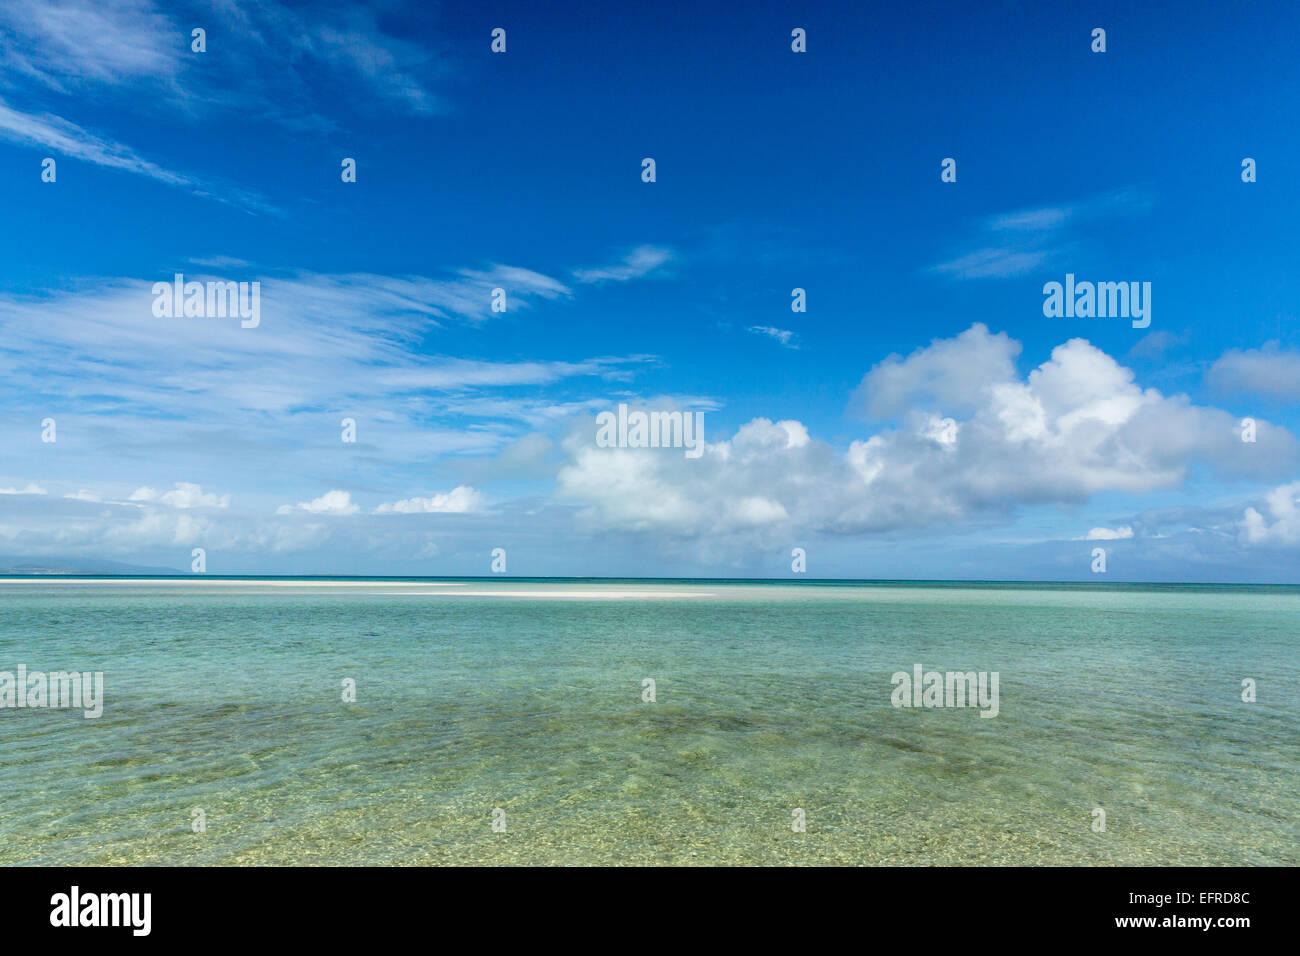 Sea of Ishigaki island, Okinawa, Japan - Stock Image